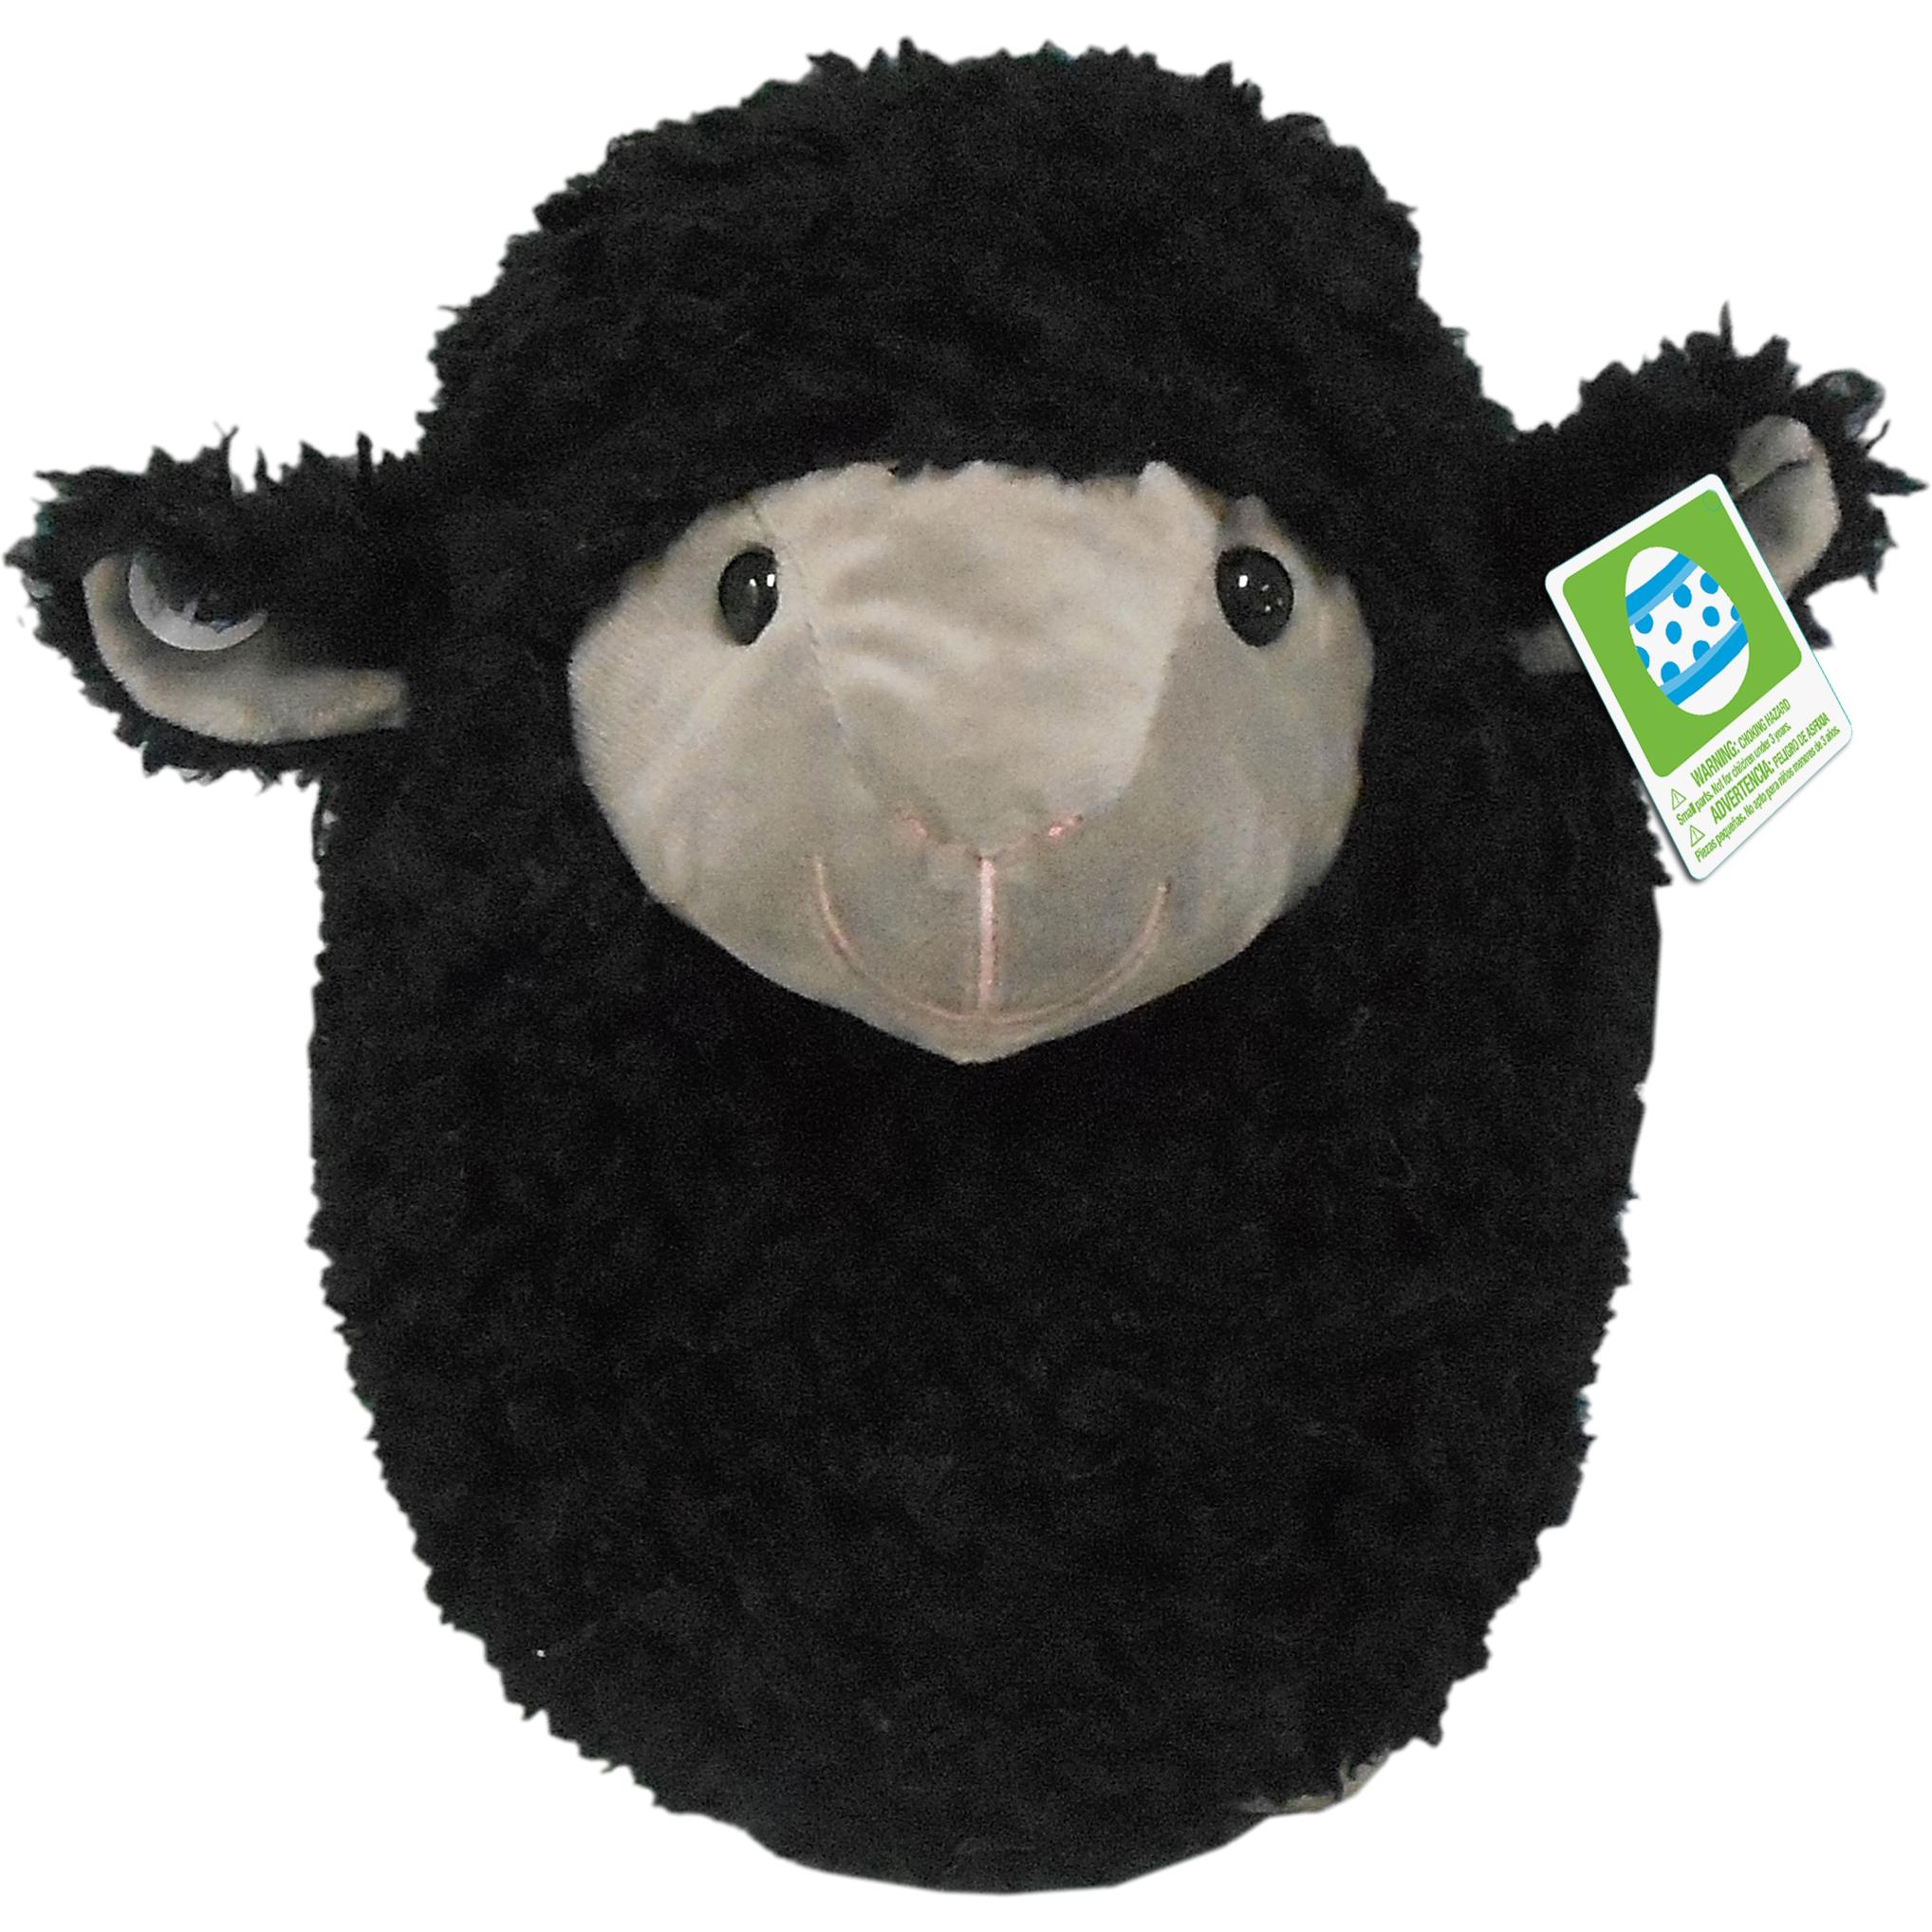 Easter 14 Black Sheep Stuffed Animal Walmart Com